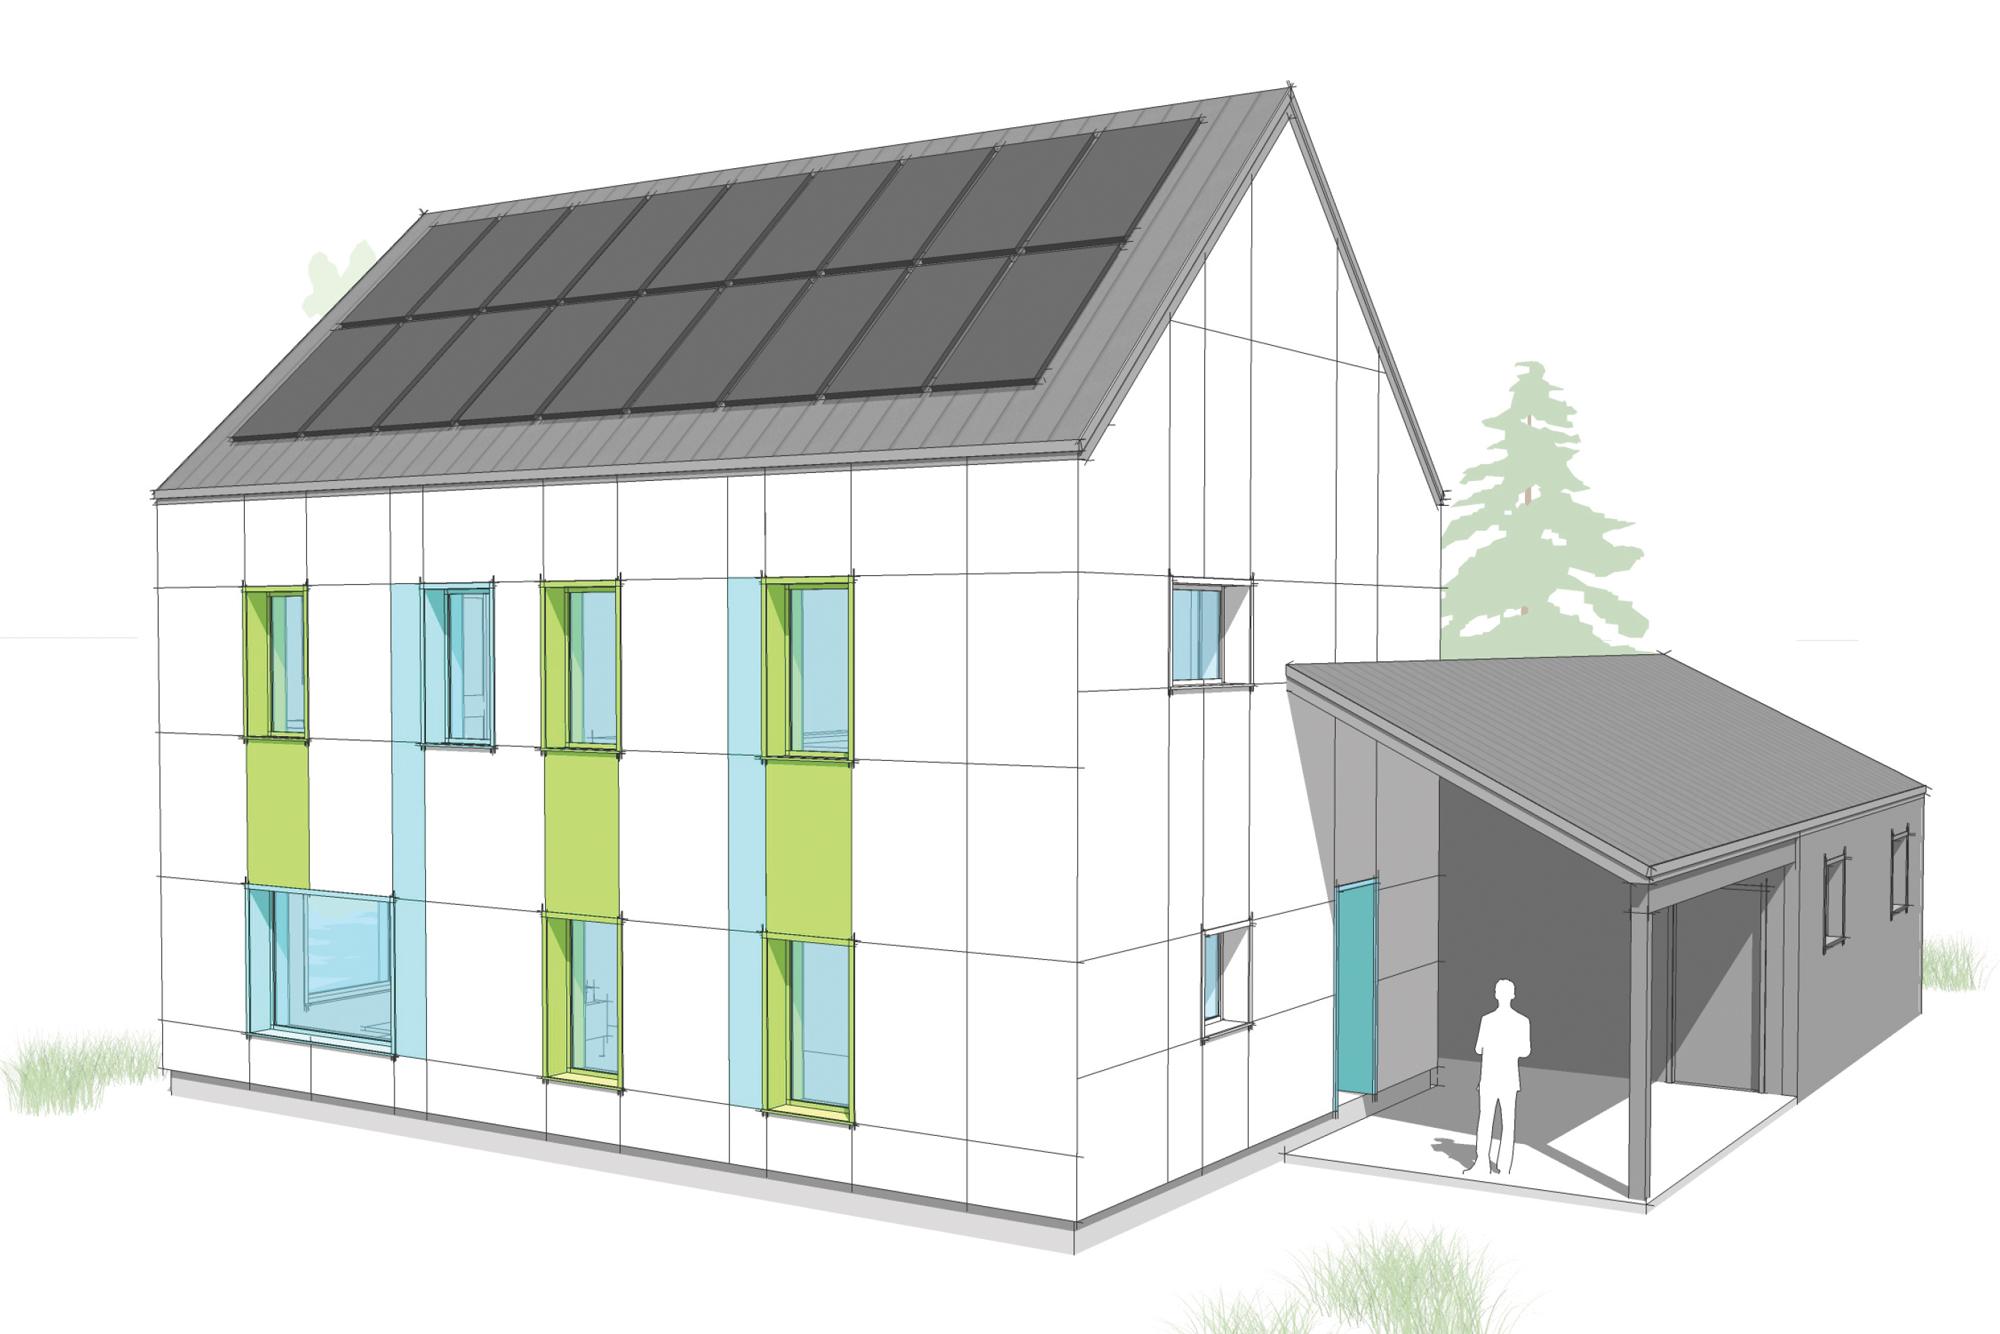 More PreFab Passive House Options for North America | Architect ...